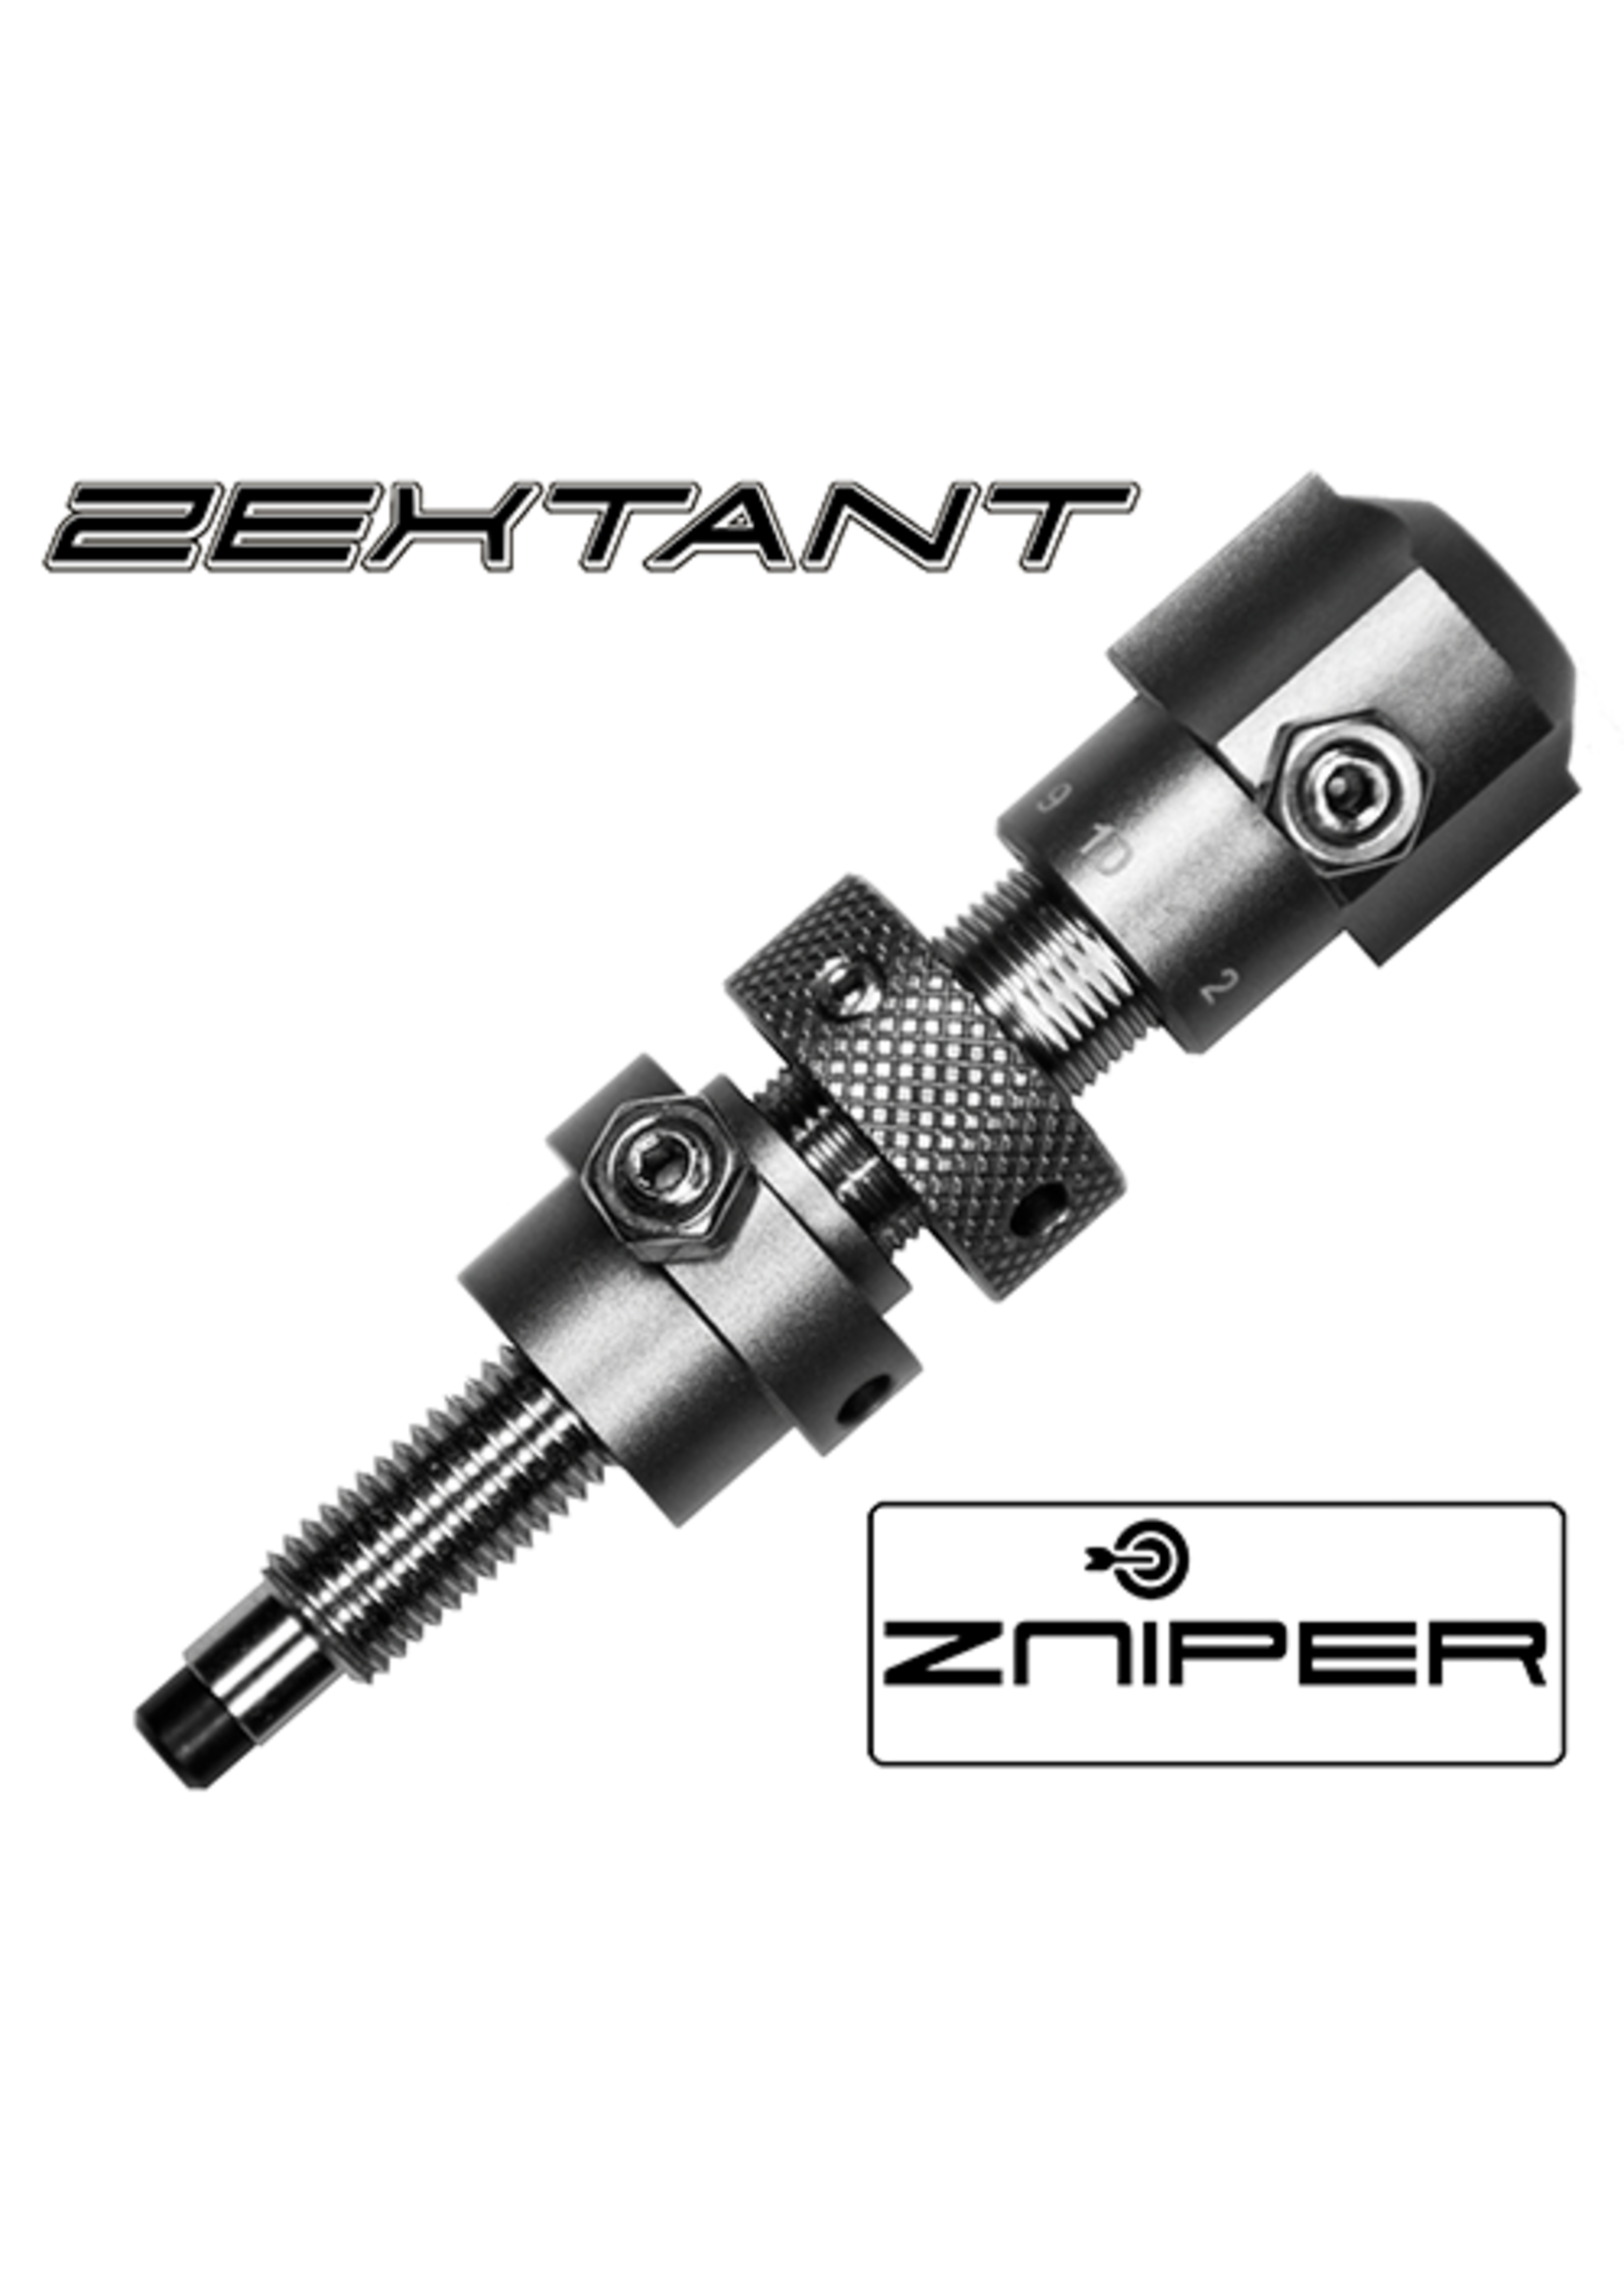 Zniper Zniper Zextant Plunger